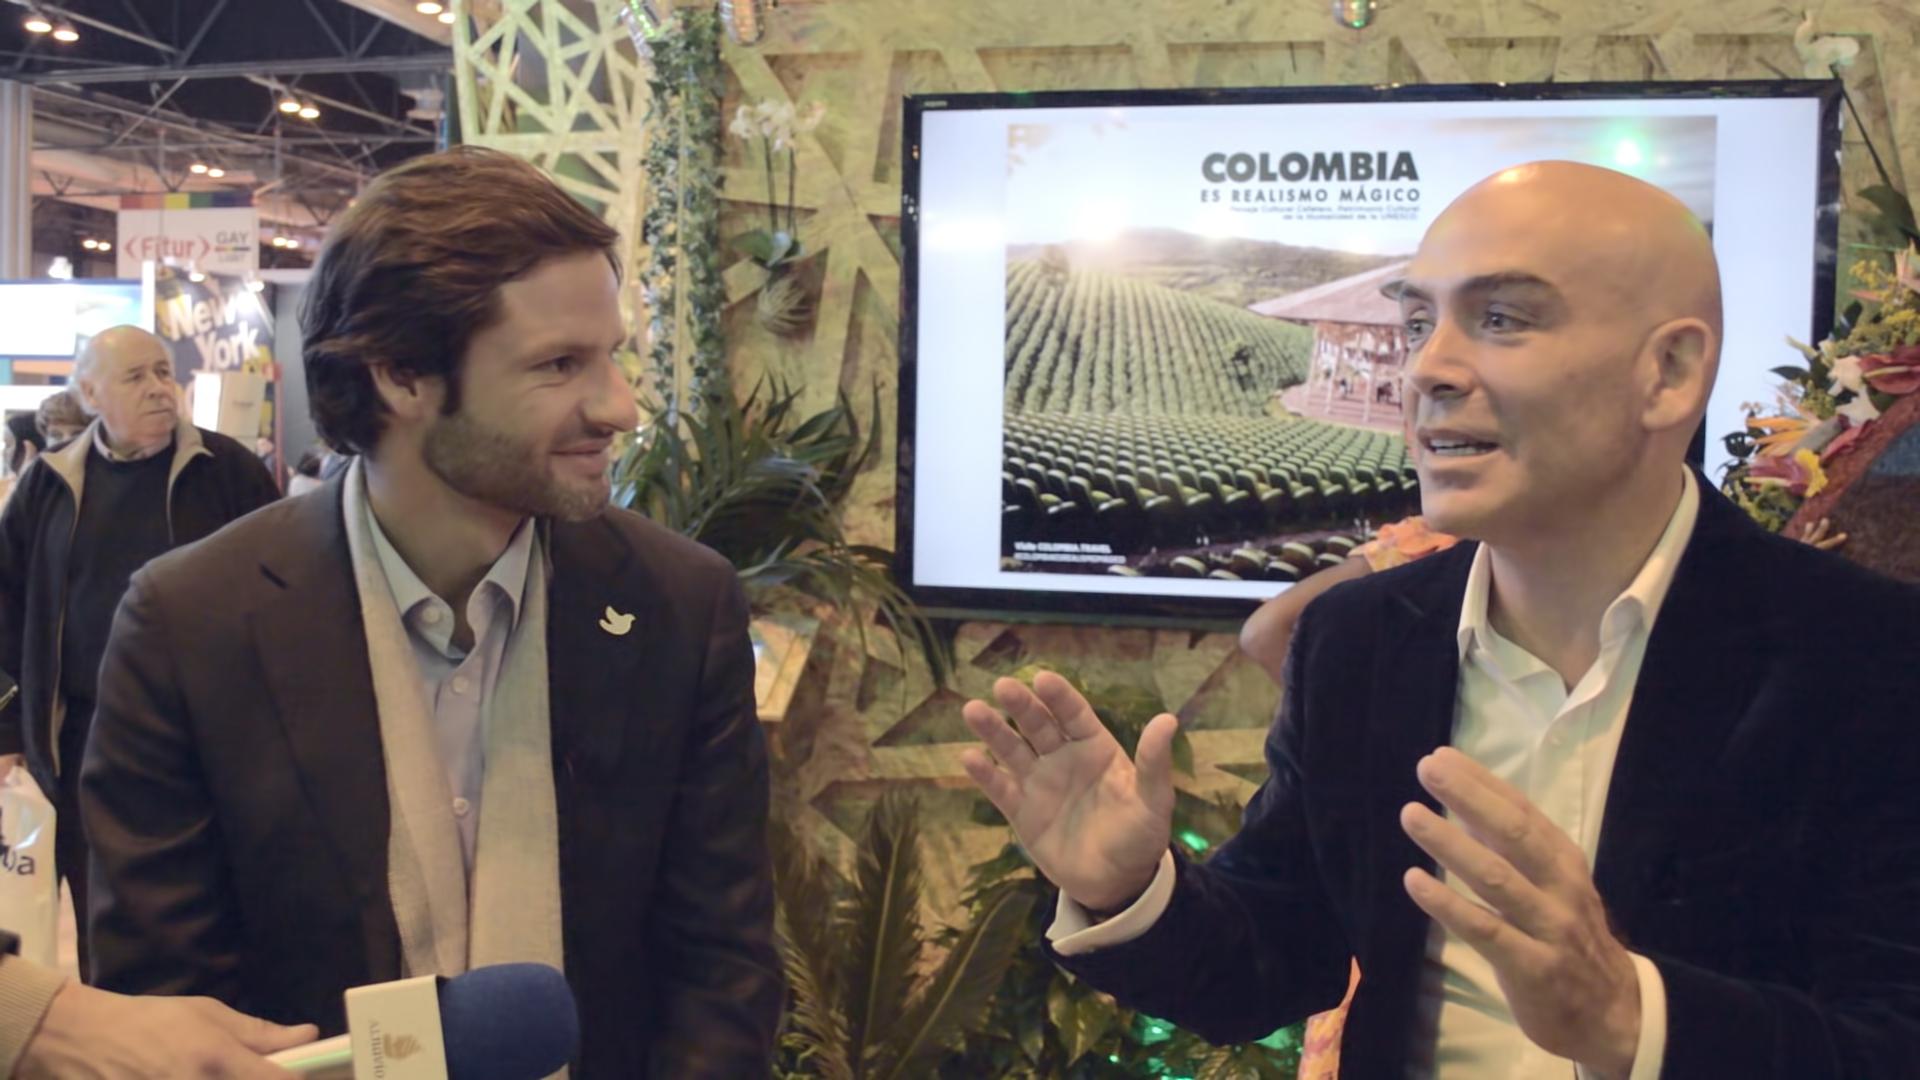 uploads_2017_01_Declaraciones_Colombia0